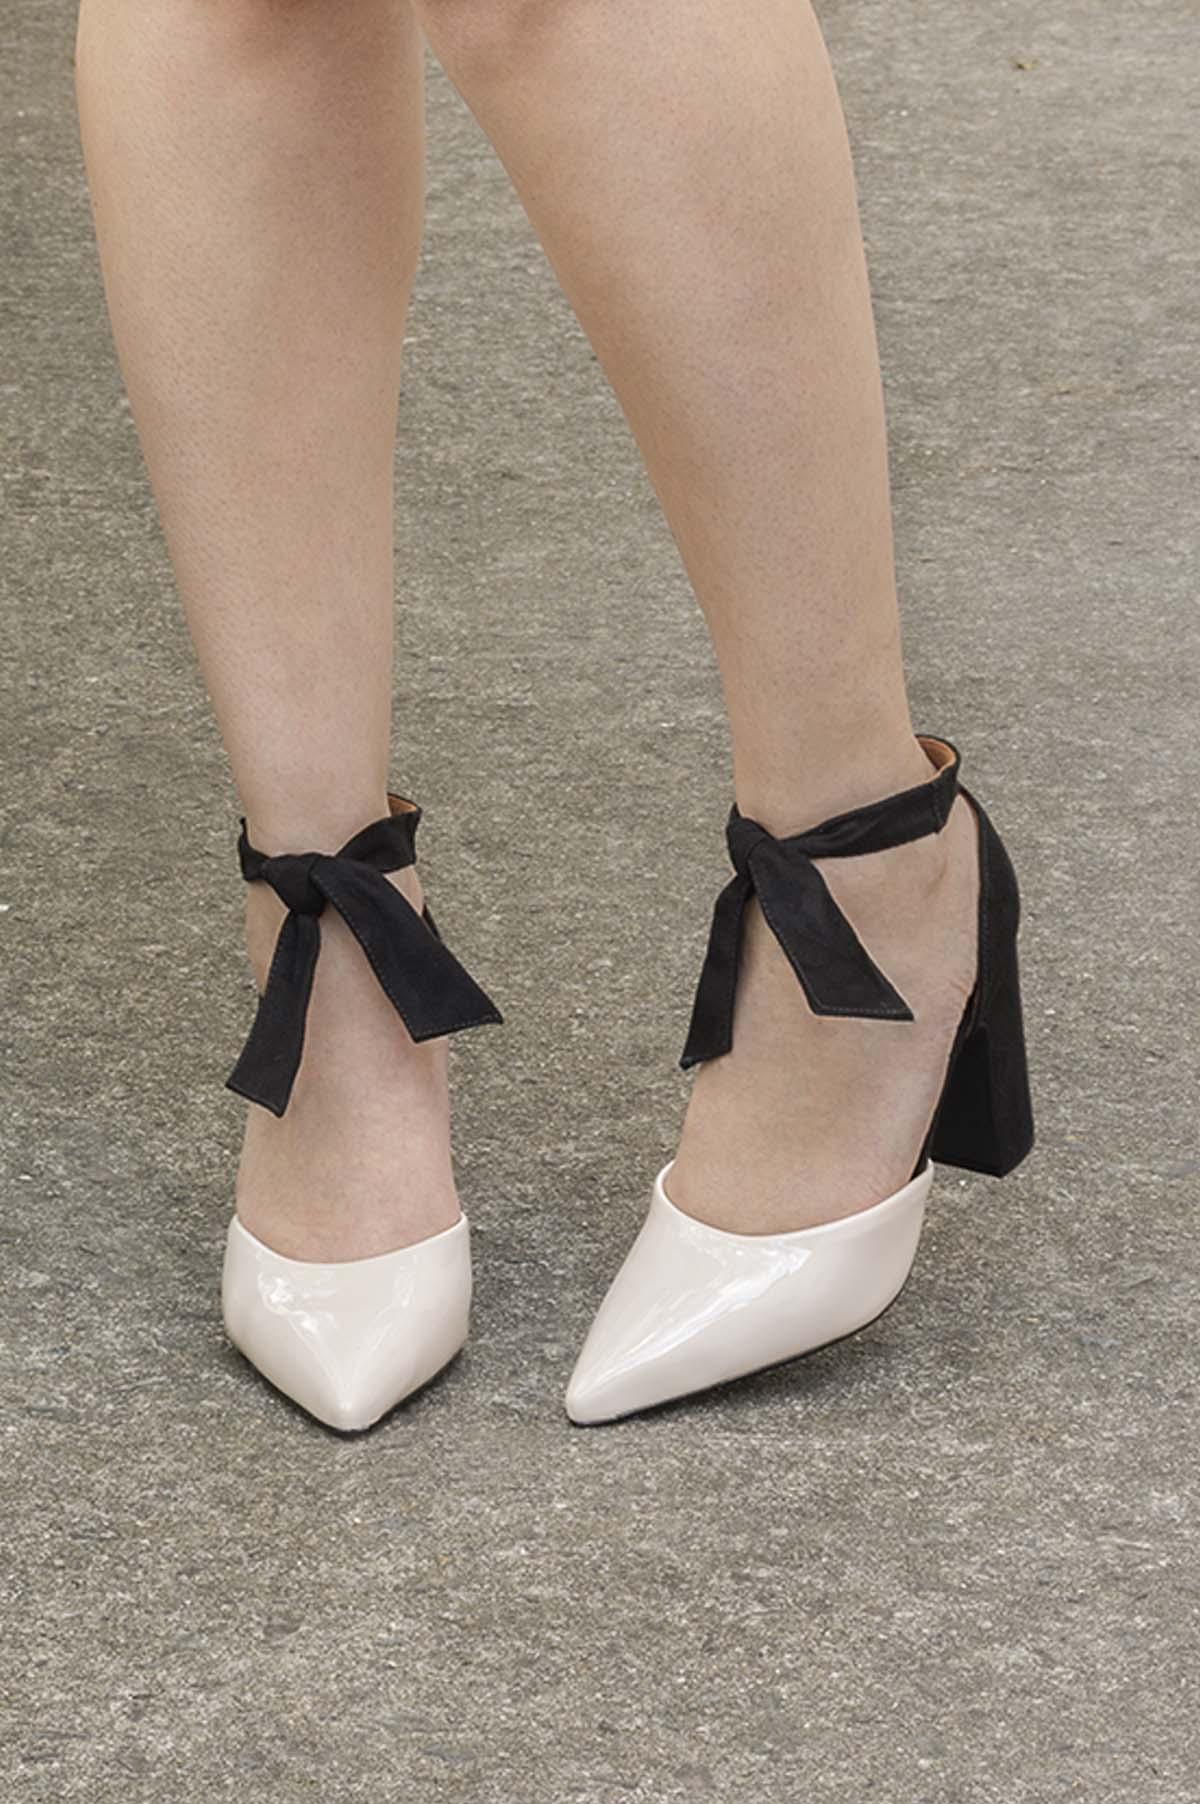 57704853a6 Sapato Salto Alto Dryka Vizzano VERNIZ - OFF WHITE - Mundial Calçados